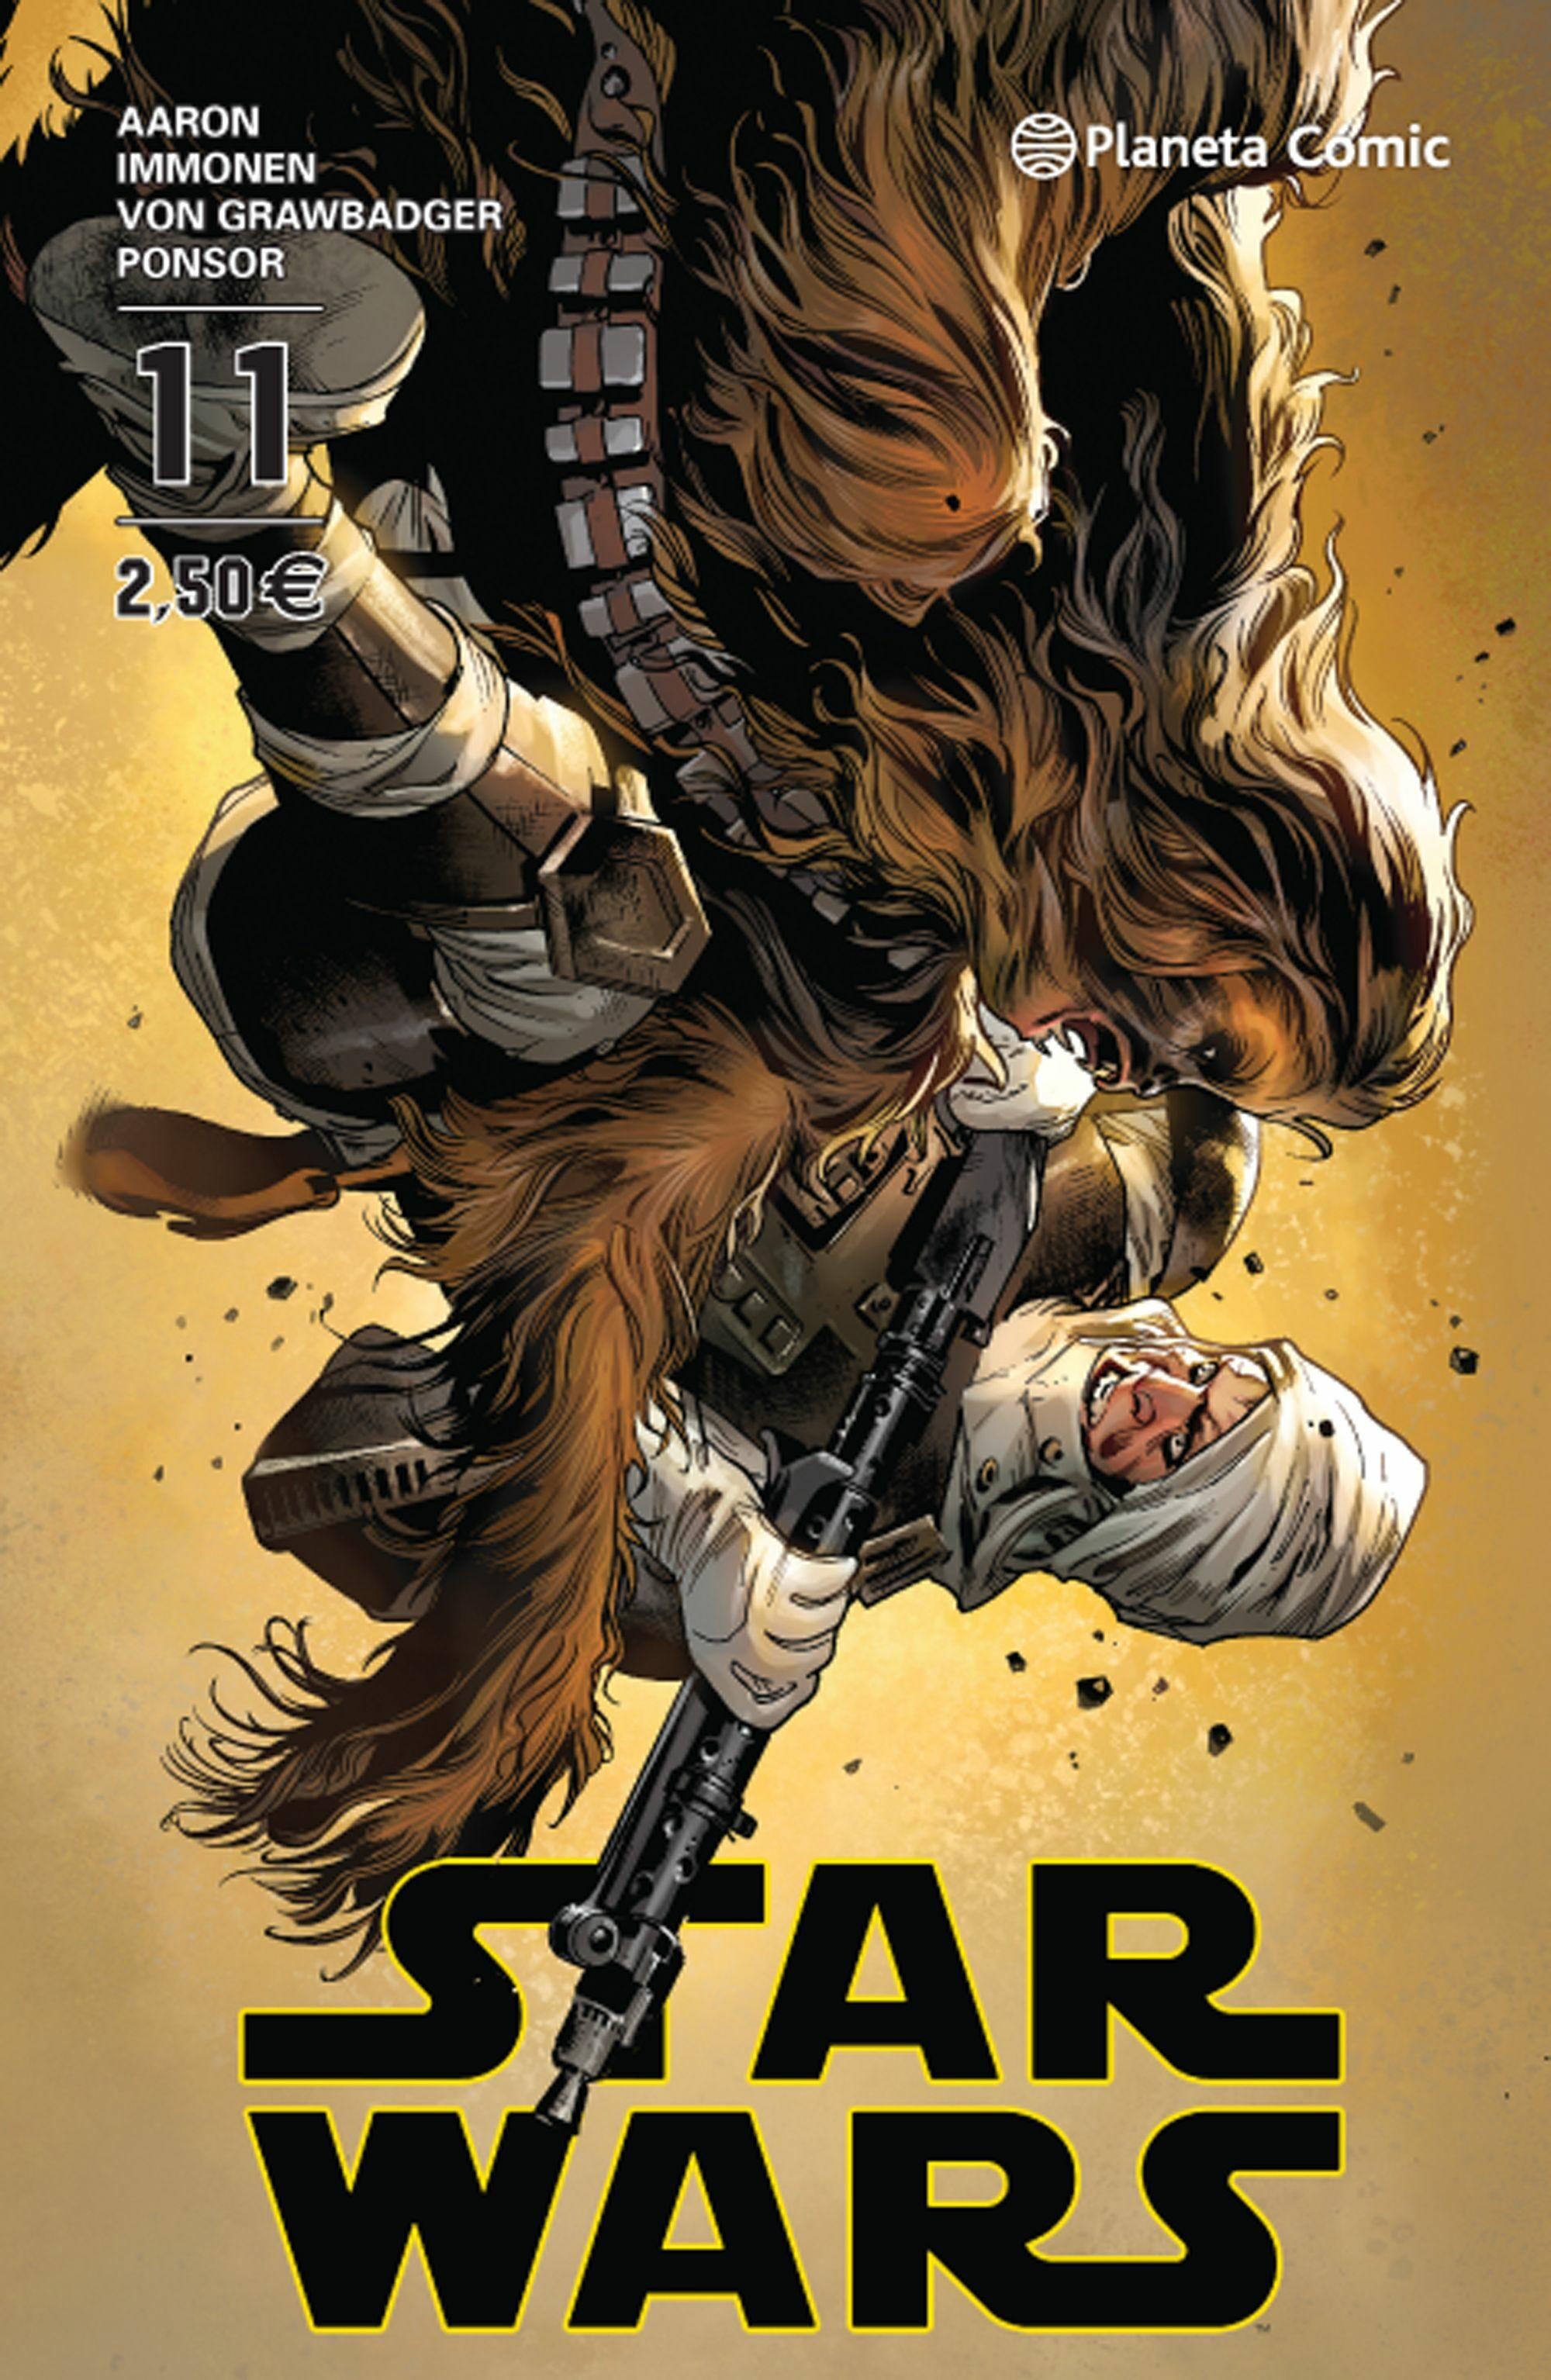 star wars nº 11-jason aaron-9788416476701